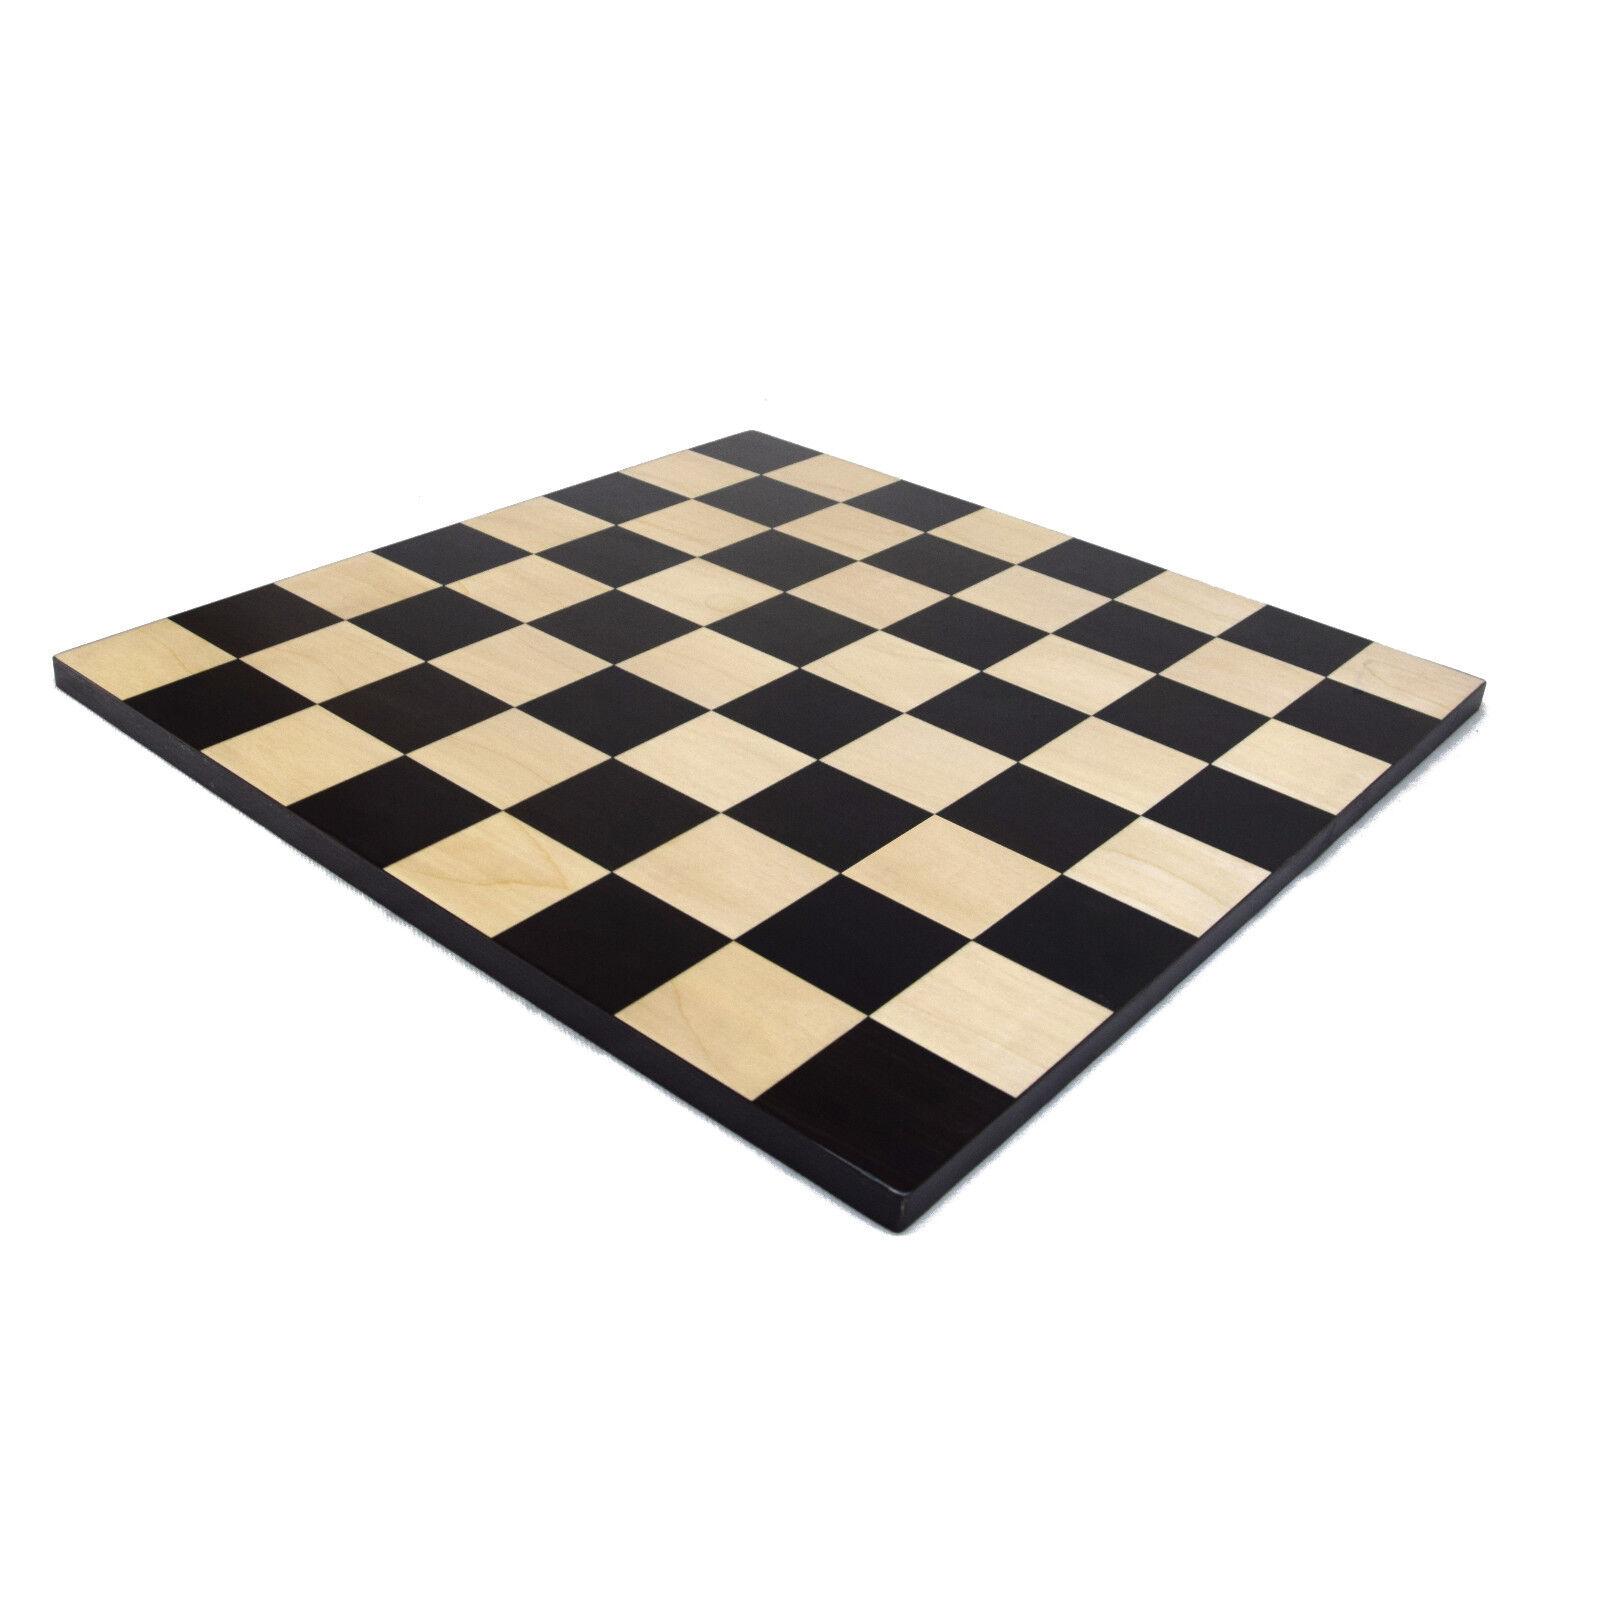 B-Ware   missing God Box Chessboard 18  ebennholz field 55mm India  les derniers modèles